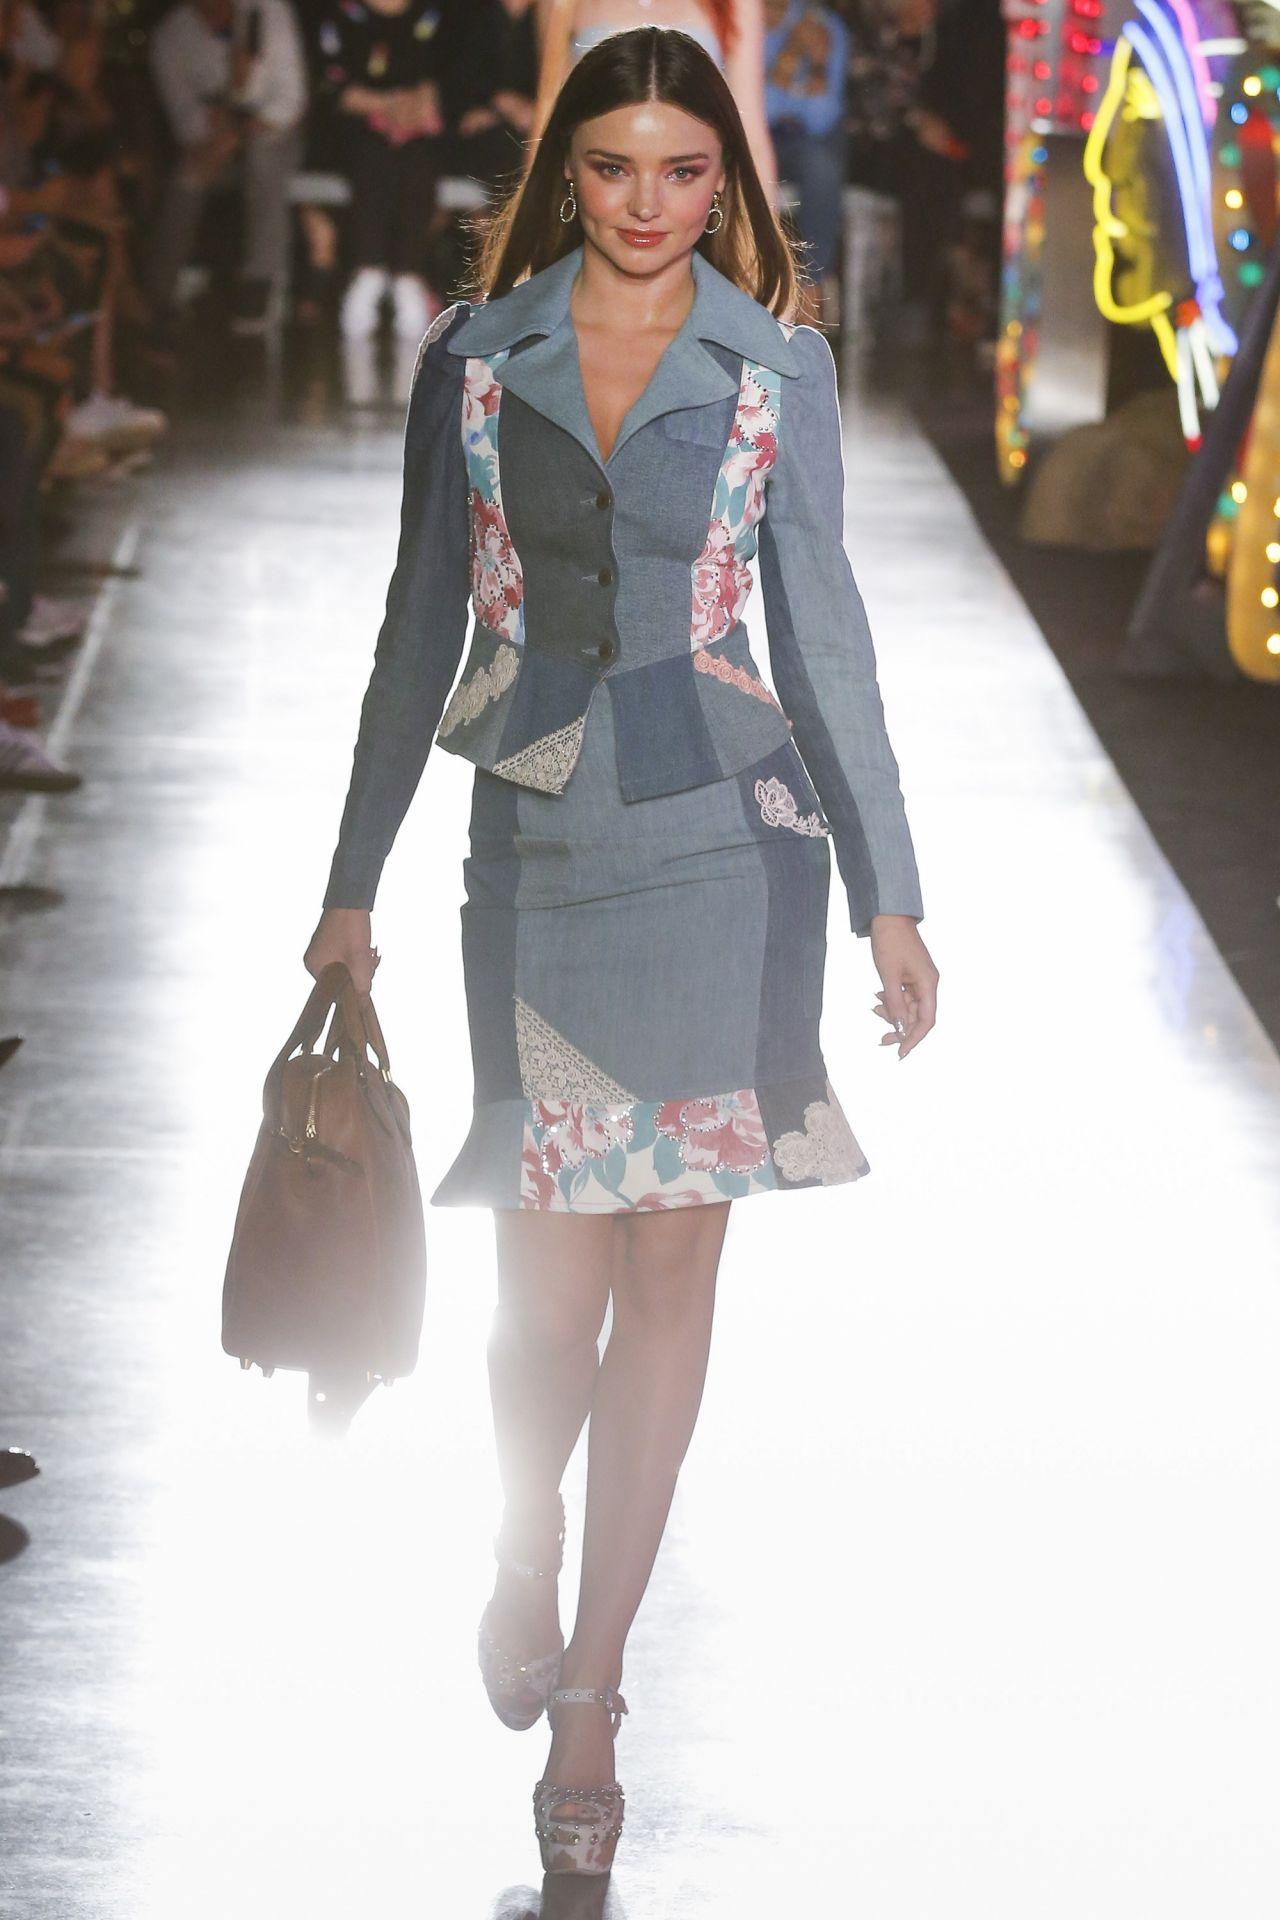 Miranda kerr runway walk moschino resort 2019 in los angeles